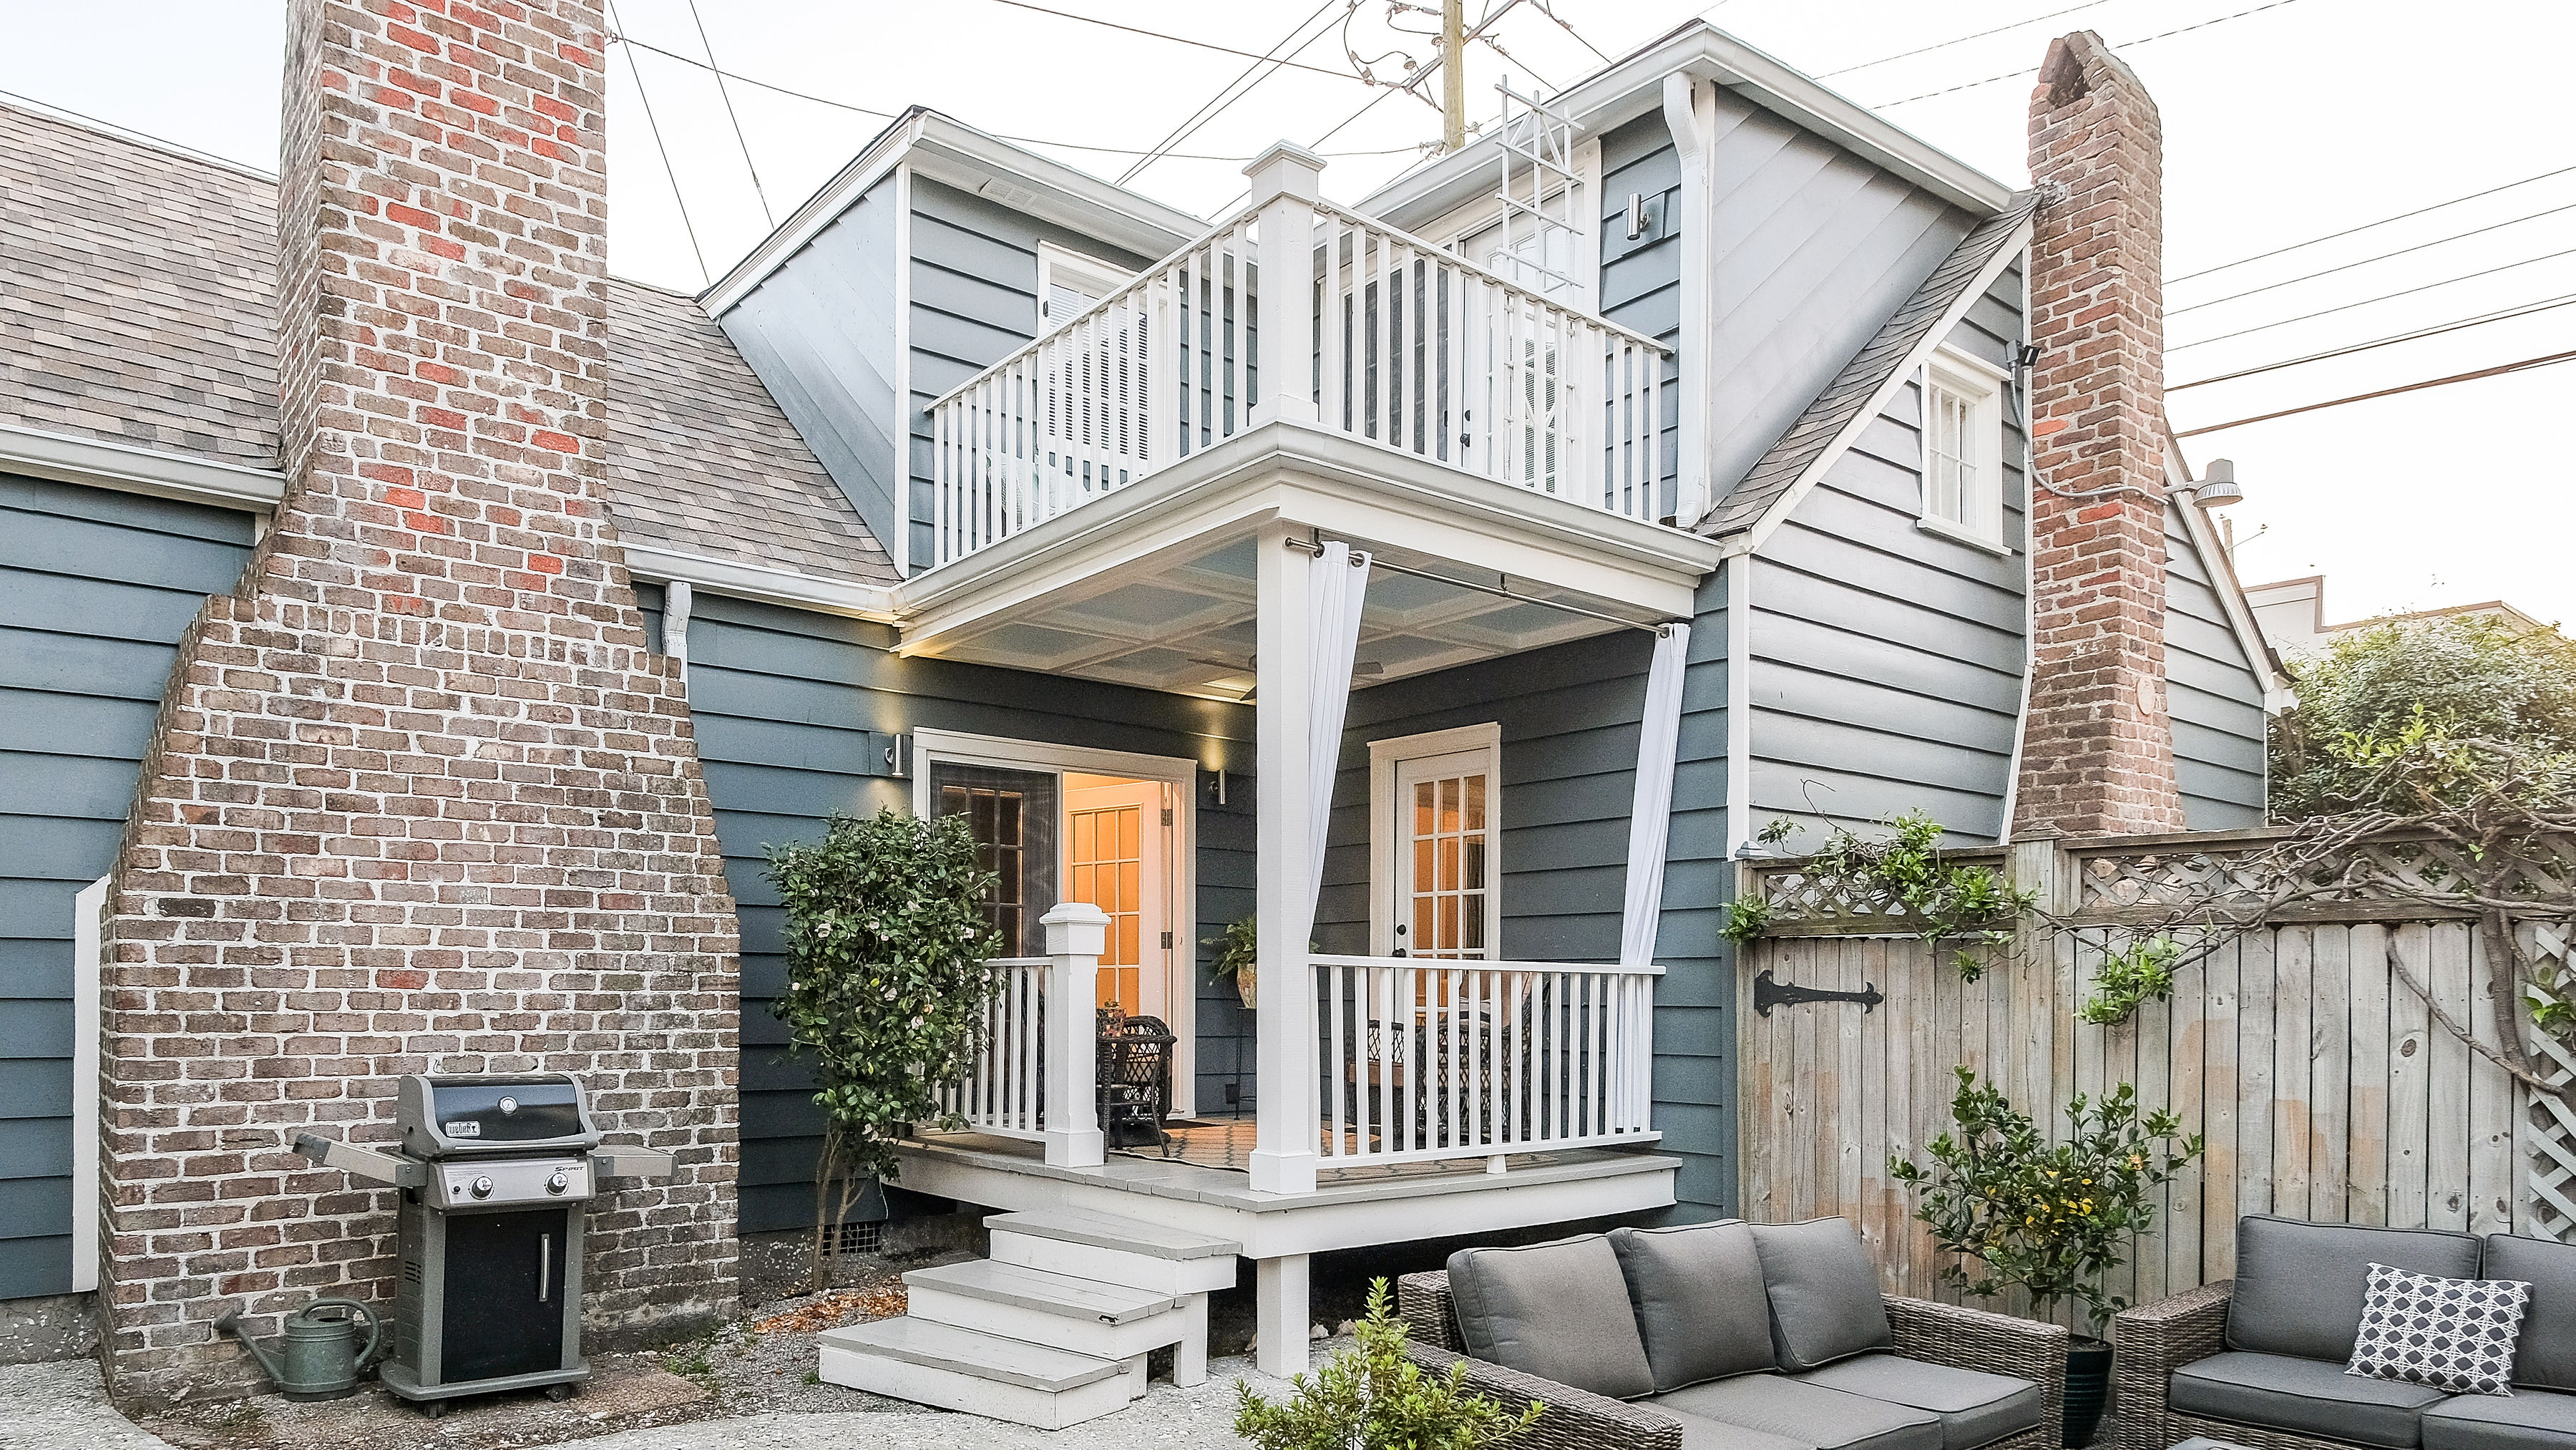 Double-decker patios